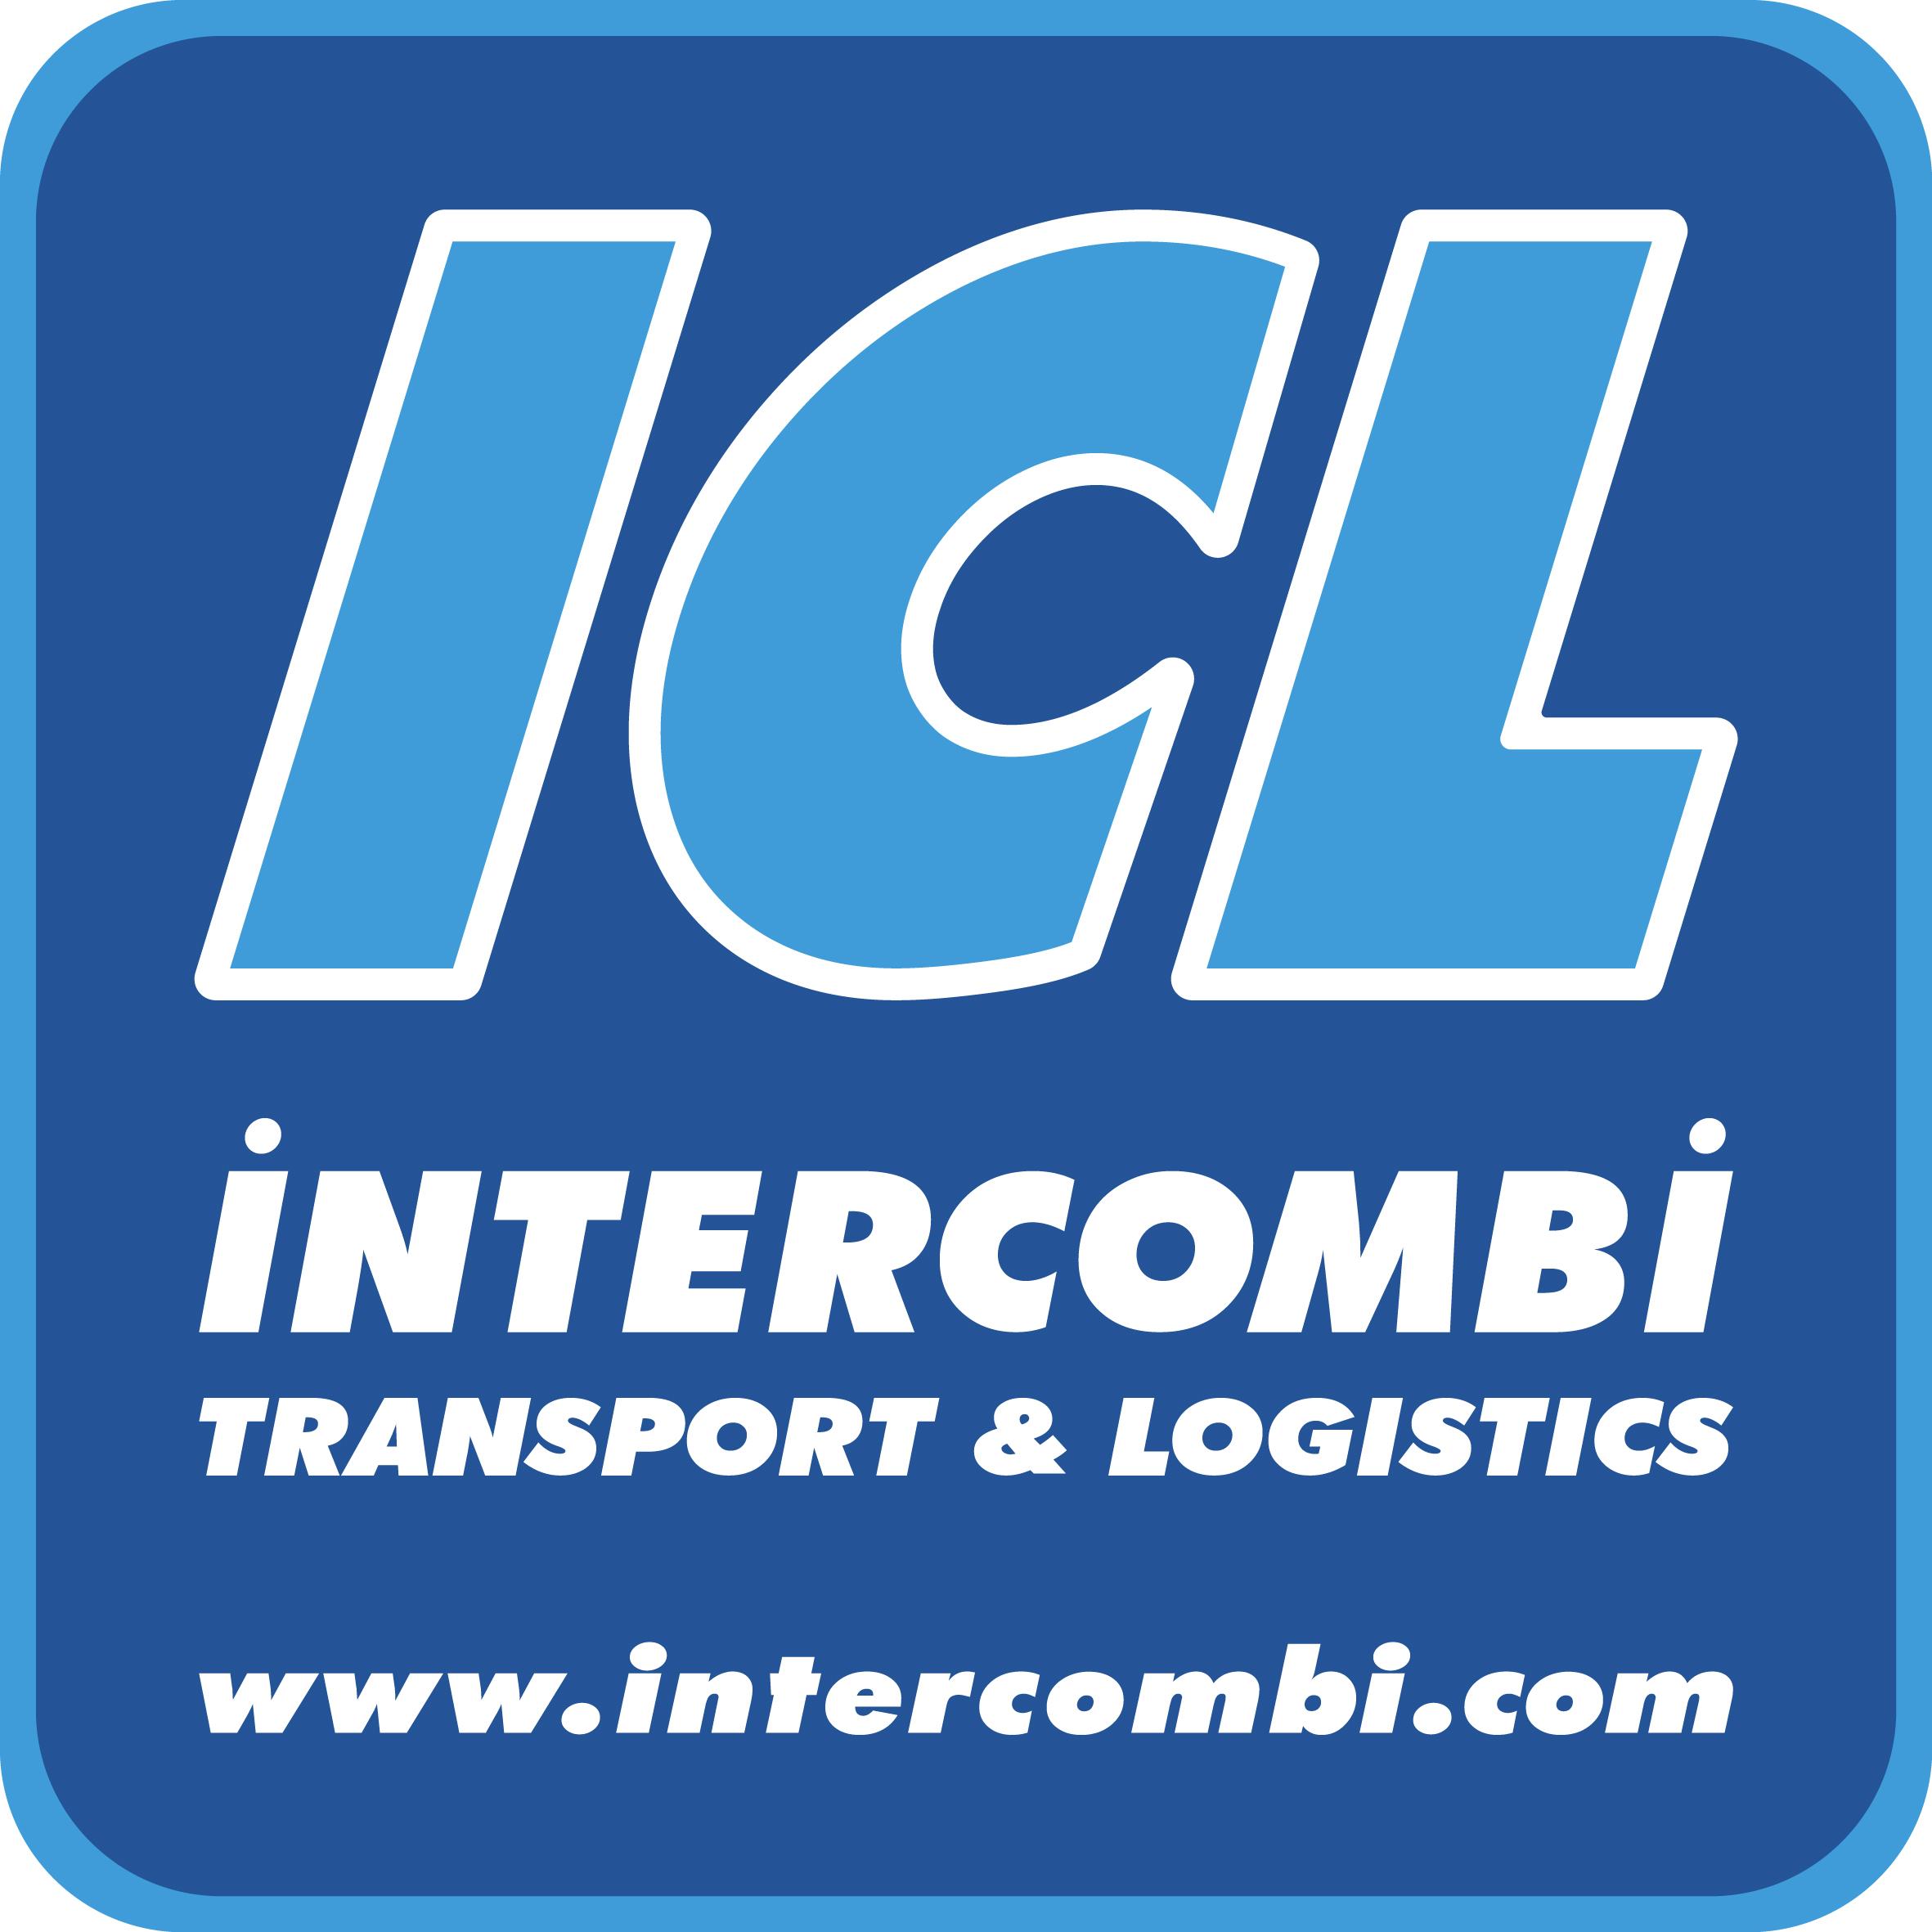 intercombi Logo photo - 1